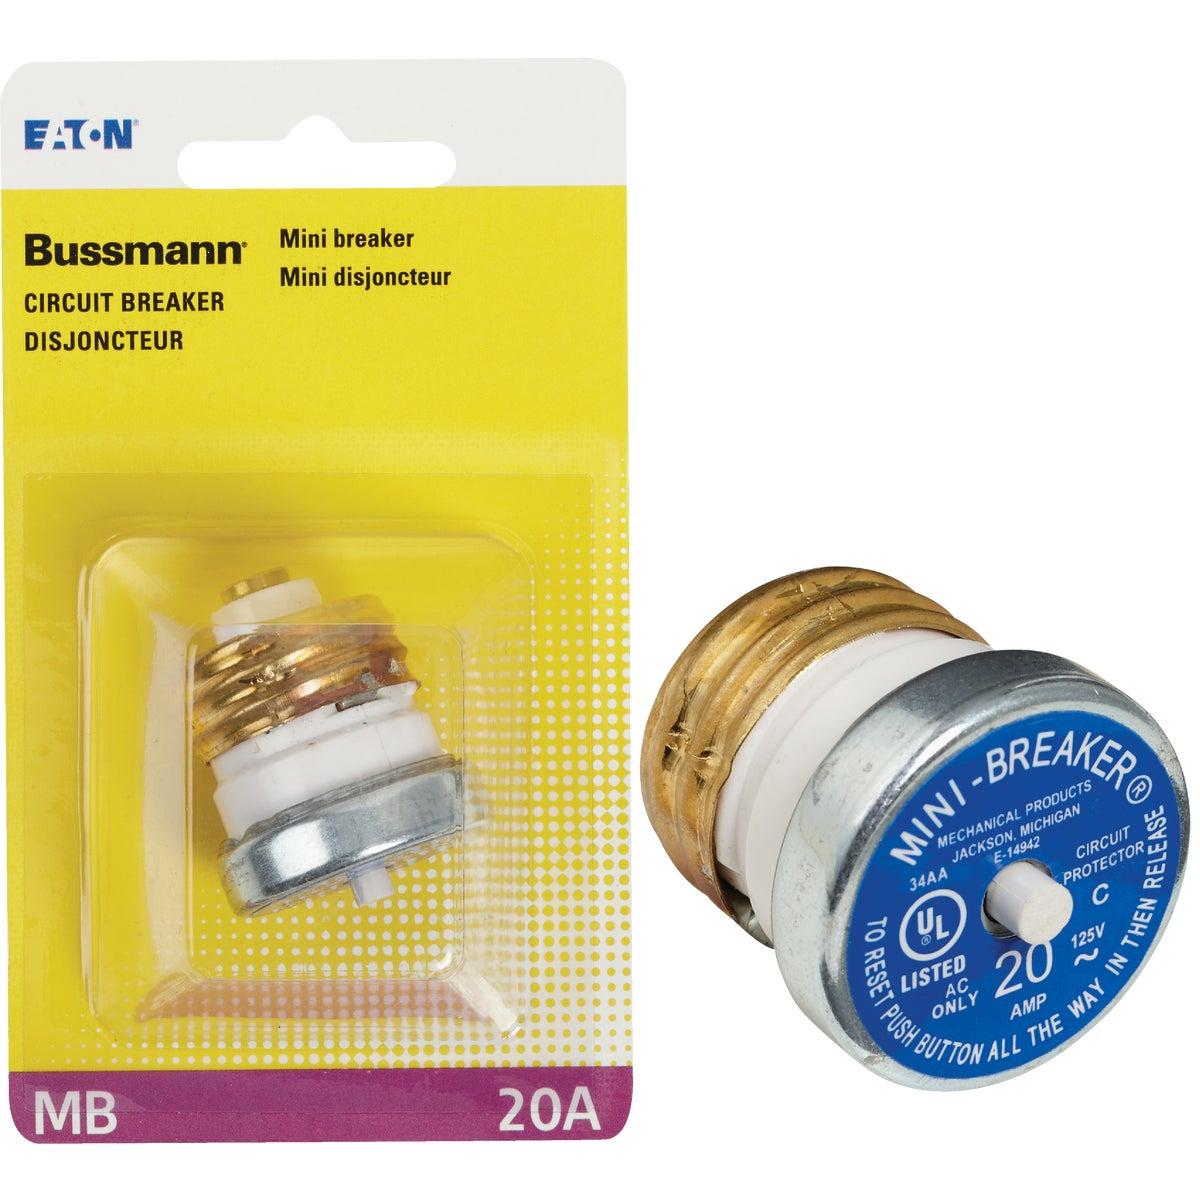 20A MINI BREAKER - BP/MB-20 by Bussmann Cooper